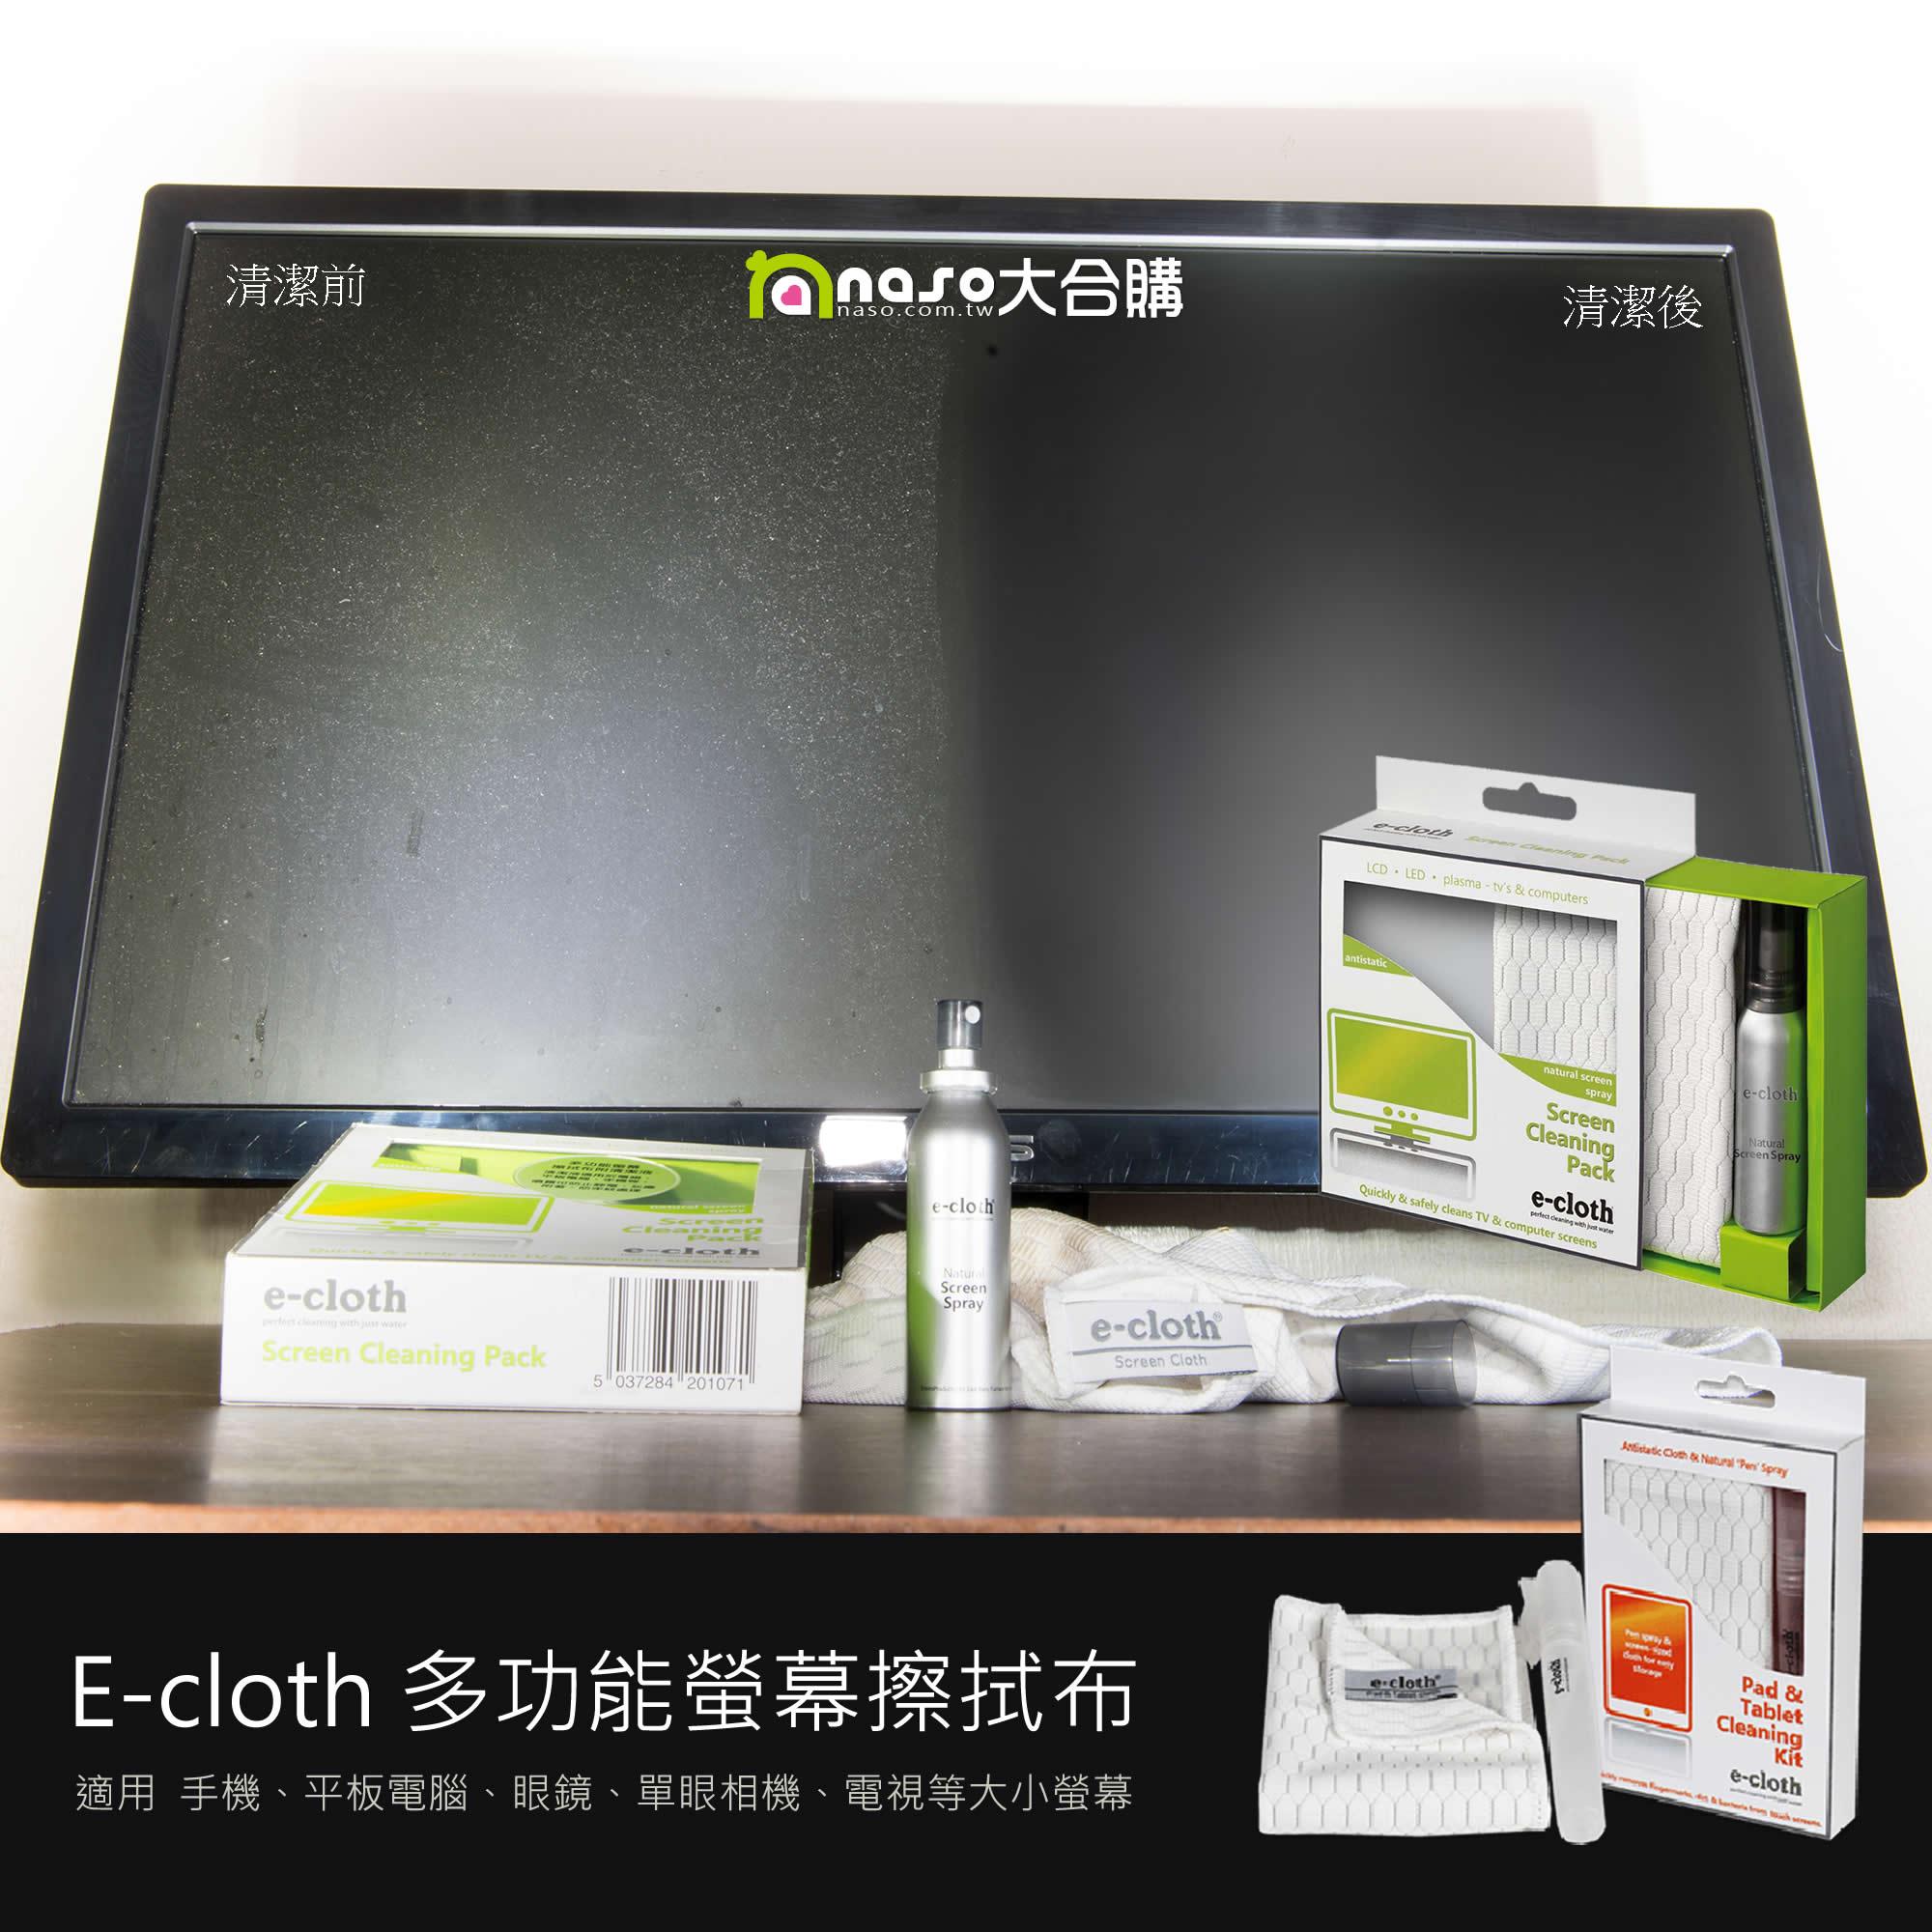 e-cloth 多功能螢幕擦拭布(DEC-201071/DEC-206373) 好評第5團